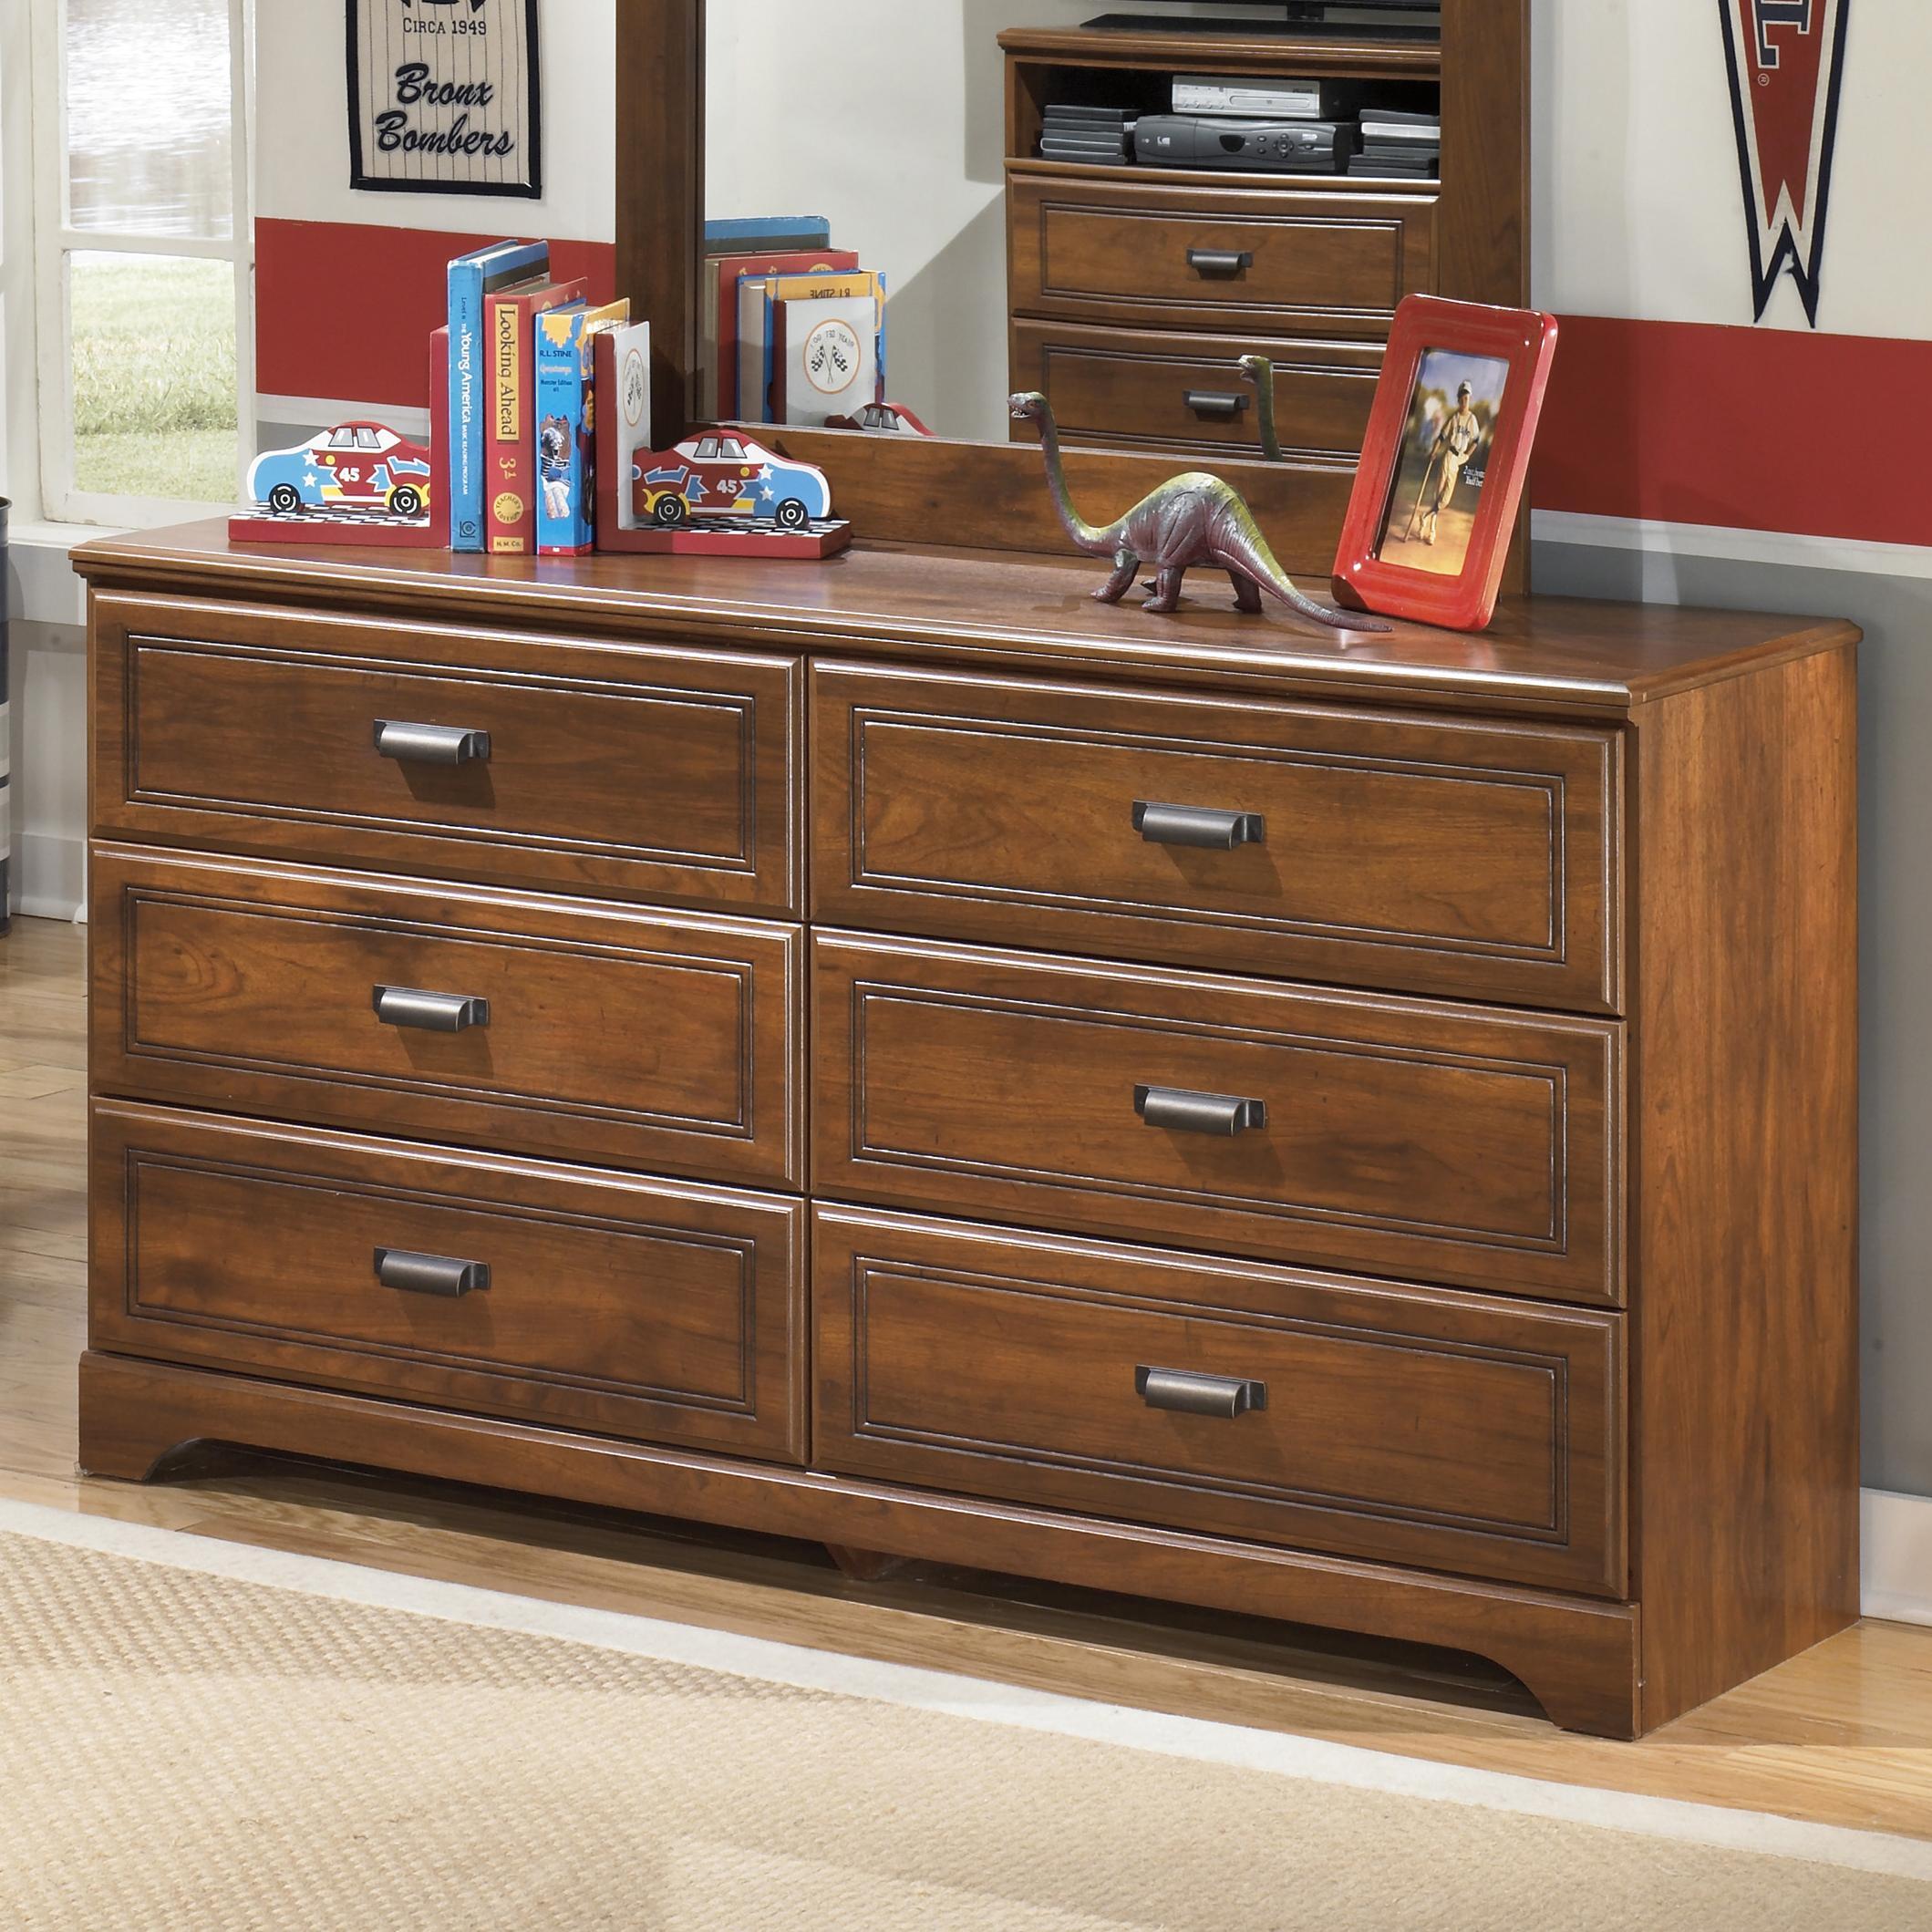 Barchan Dresser by Ashley (Signature Design) at Johnny Janosik